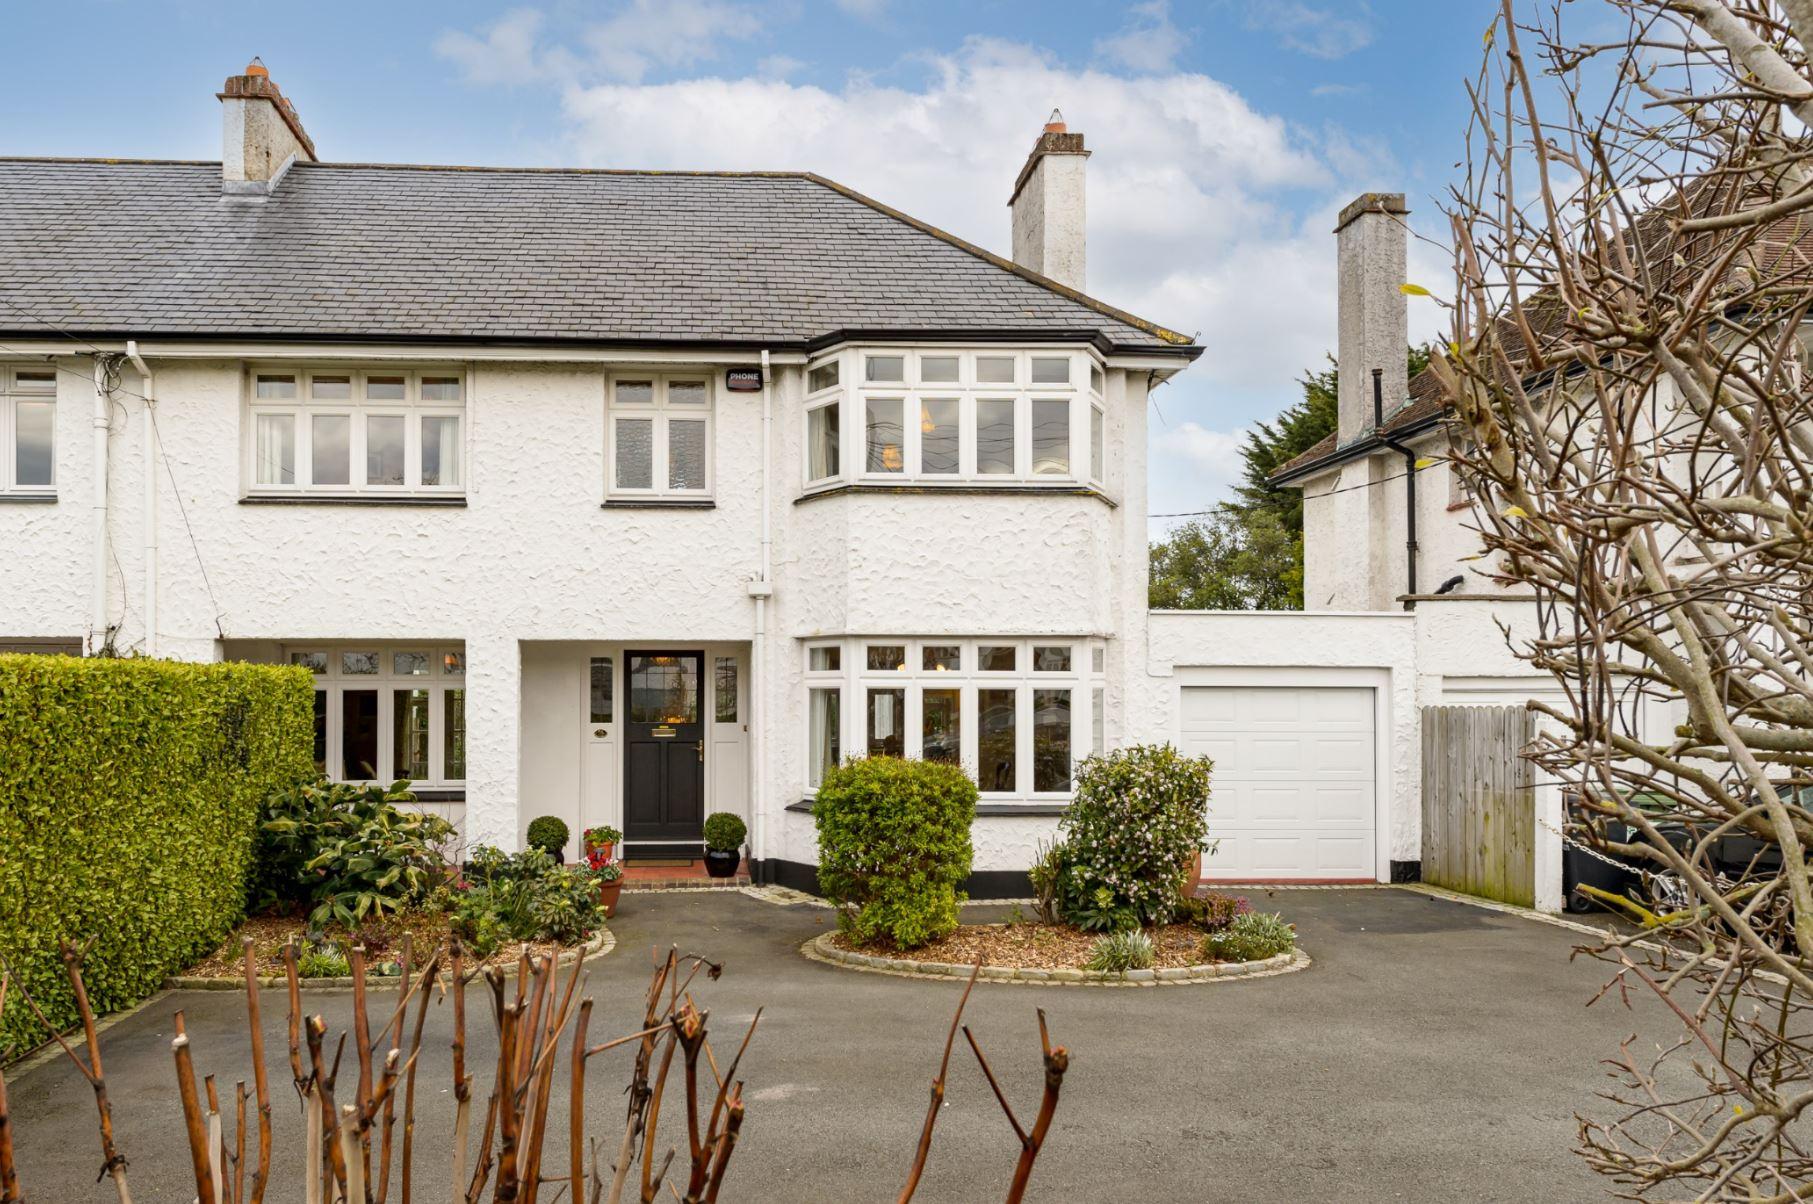 16 Sycamore Road, Mount Merrion, Co. Dublin